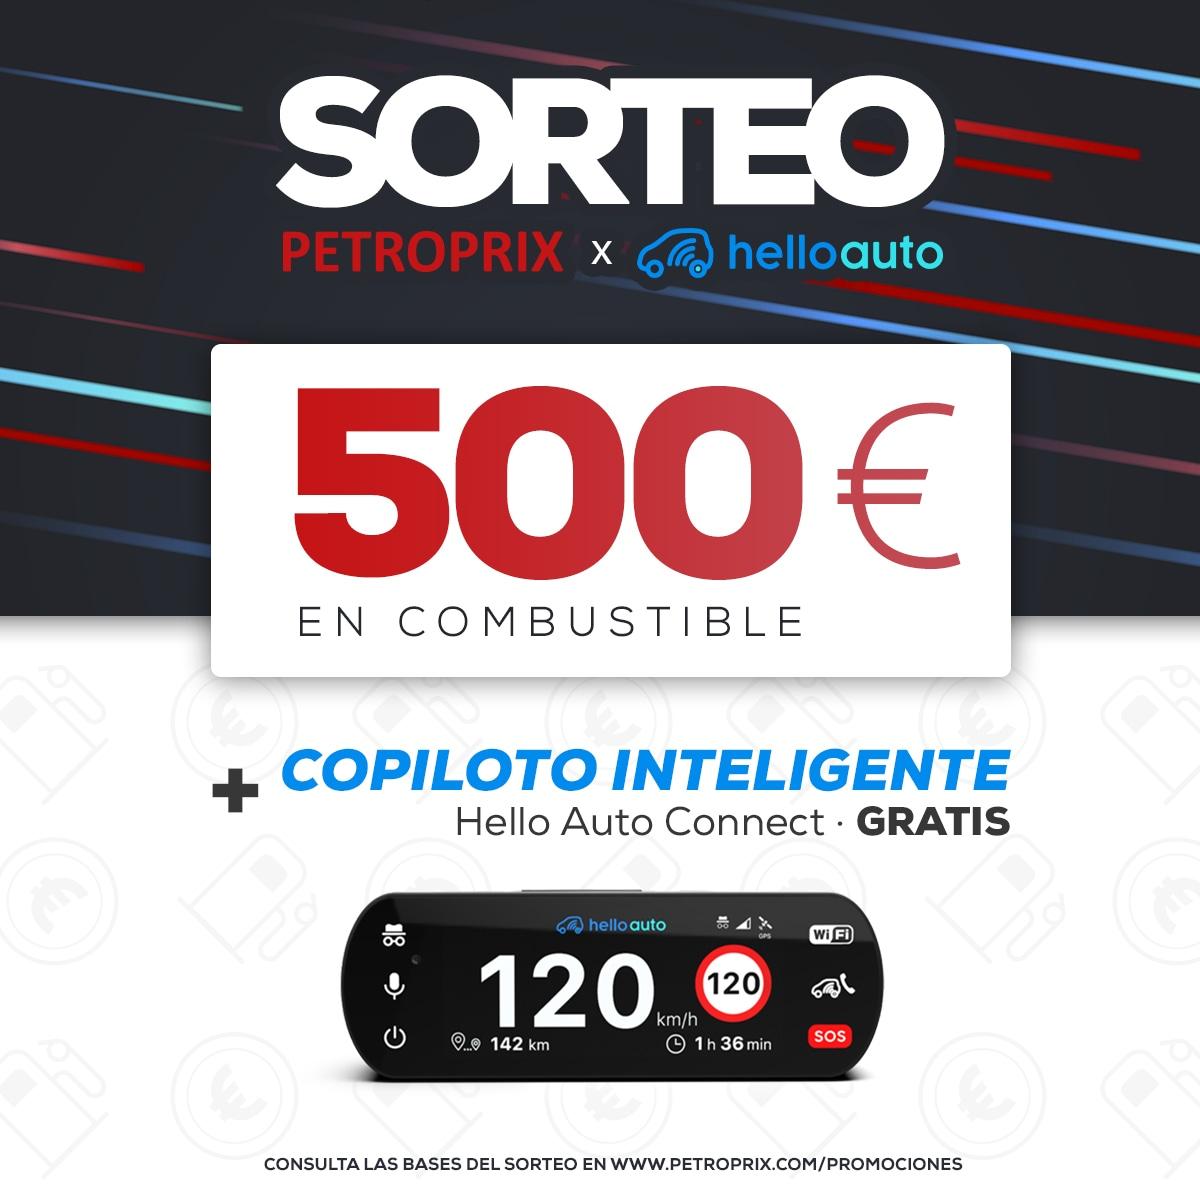 �500 in Fuel + Smart Copilot. PETROPRIX Giveaway x HELLO AUTO Giveaway Image